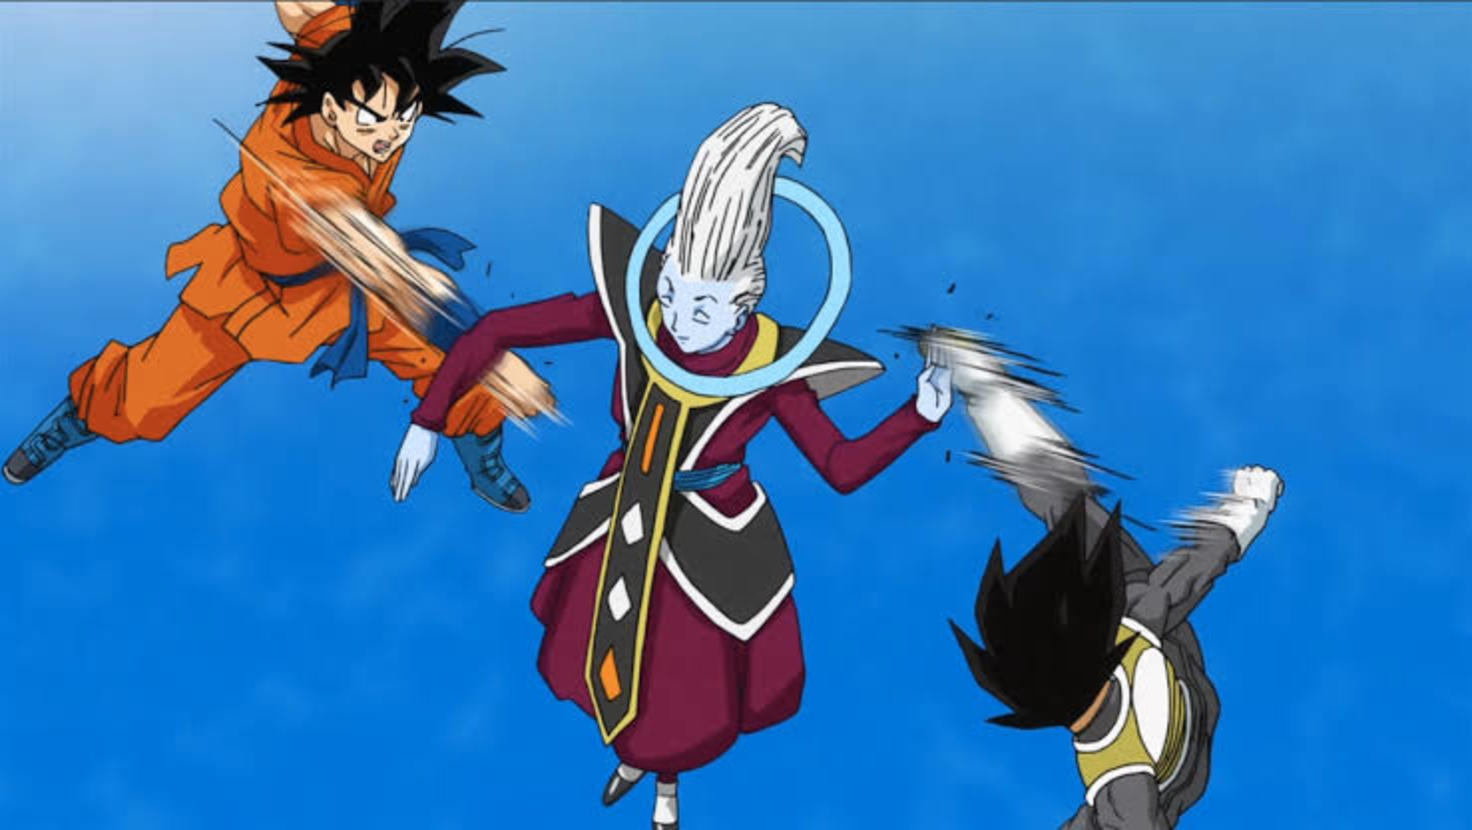 Dragon Ball Super Manga Chapter 70 Spoilers